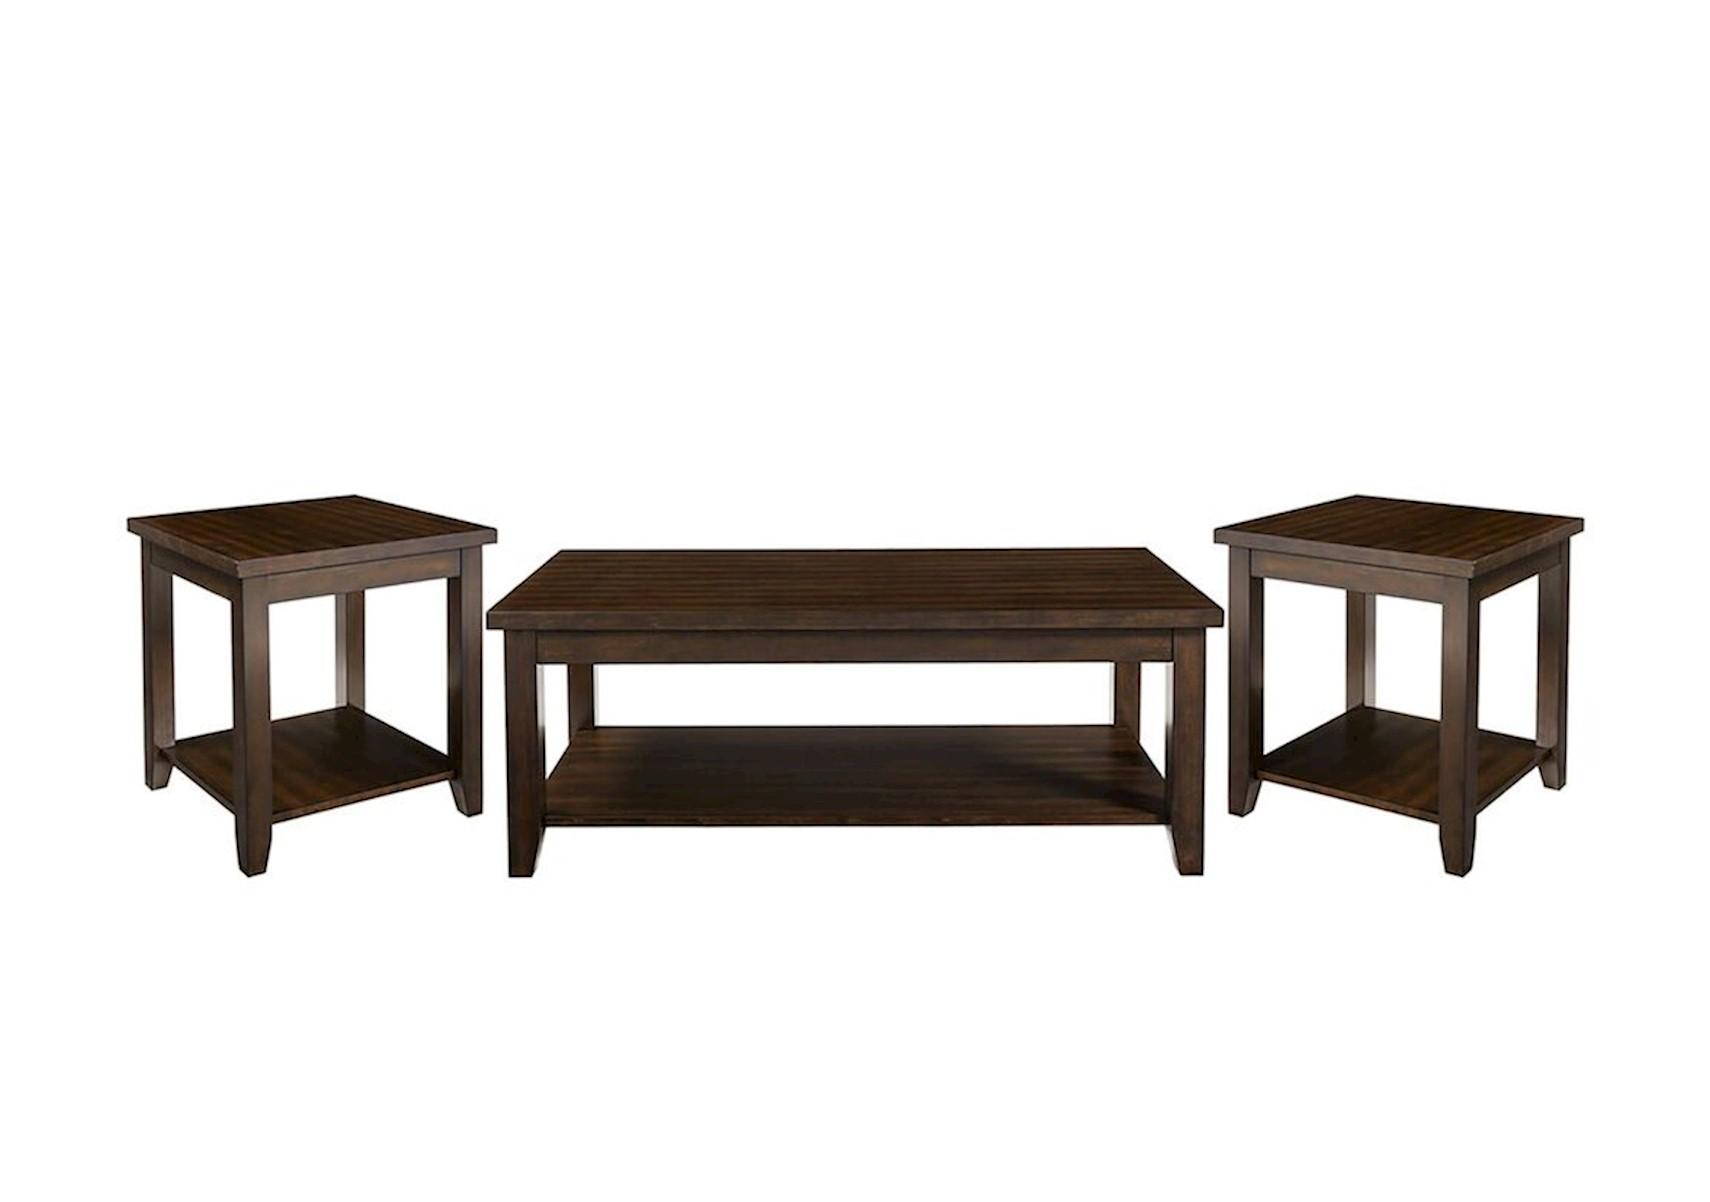 Terrific Lacks Richmond 3 Pc Coffee Table Set Creativecarmelina Interior Chair Design Creativecarmelinacom